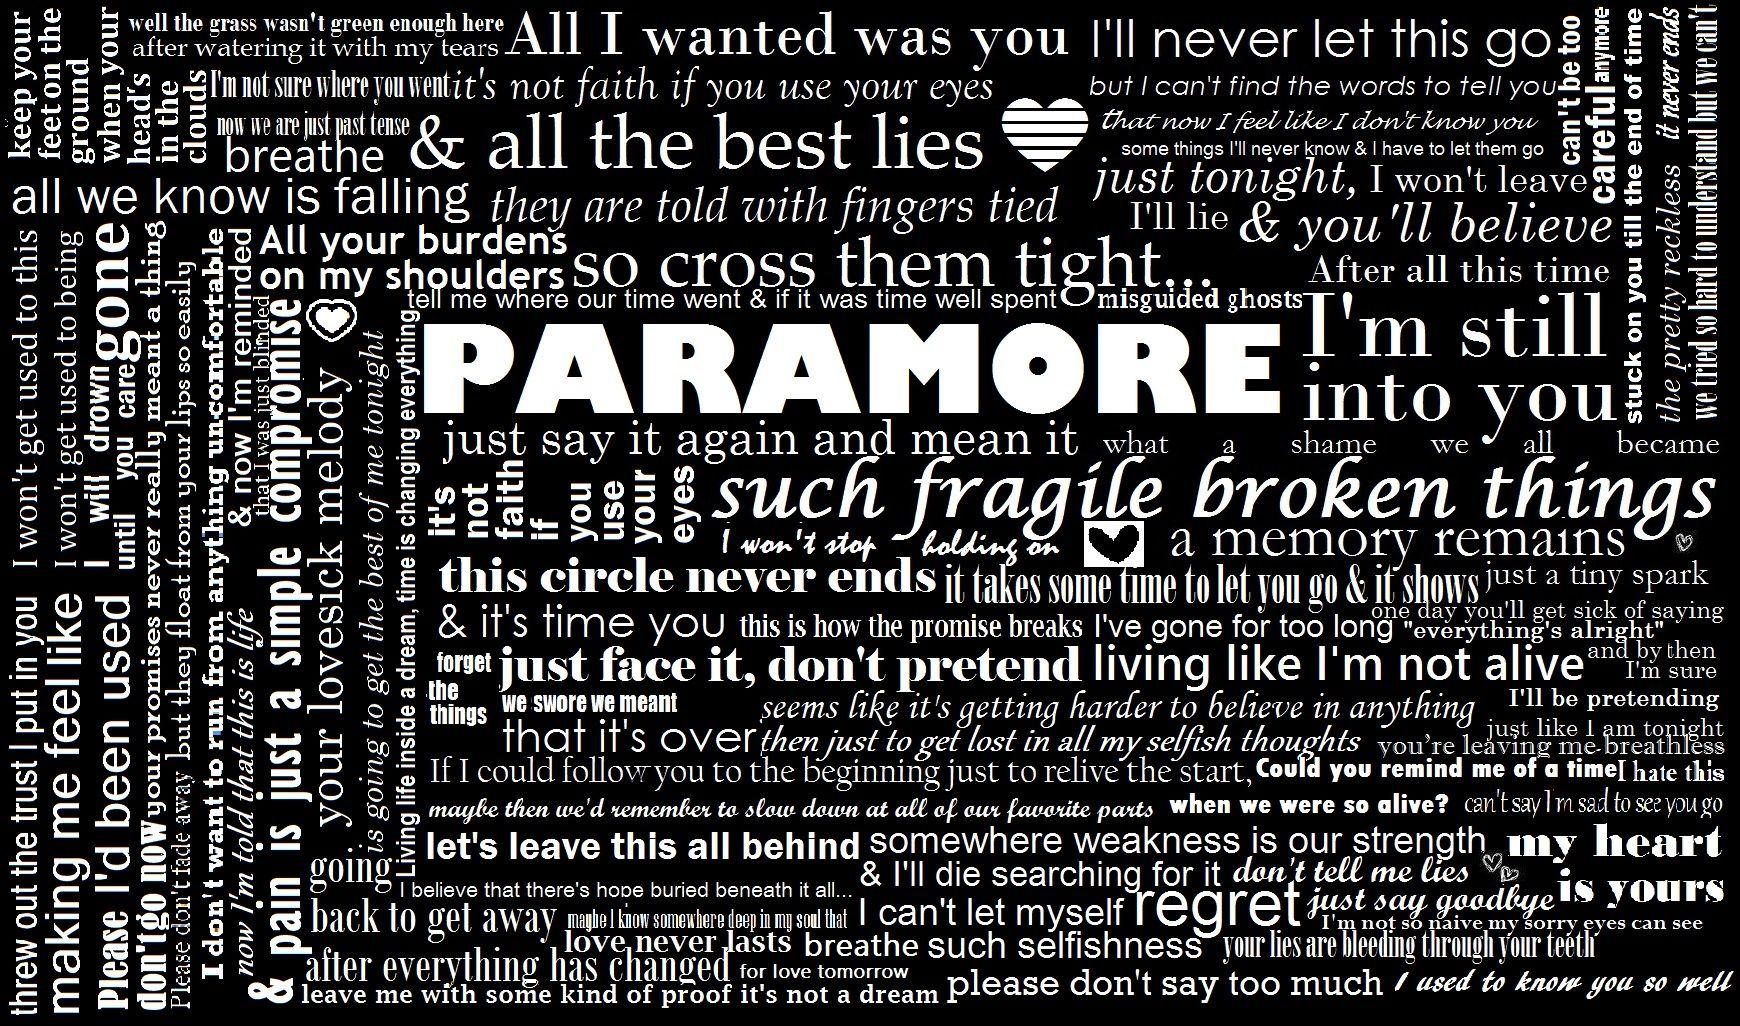 paramore song lyrics - photo #34